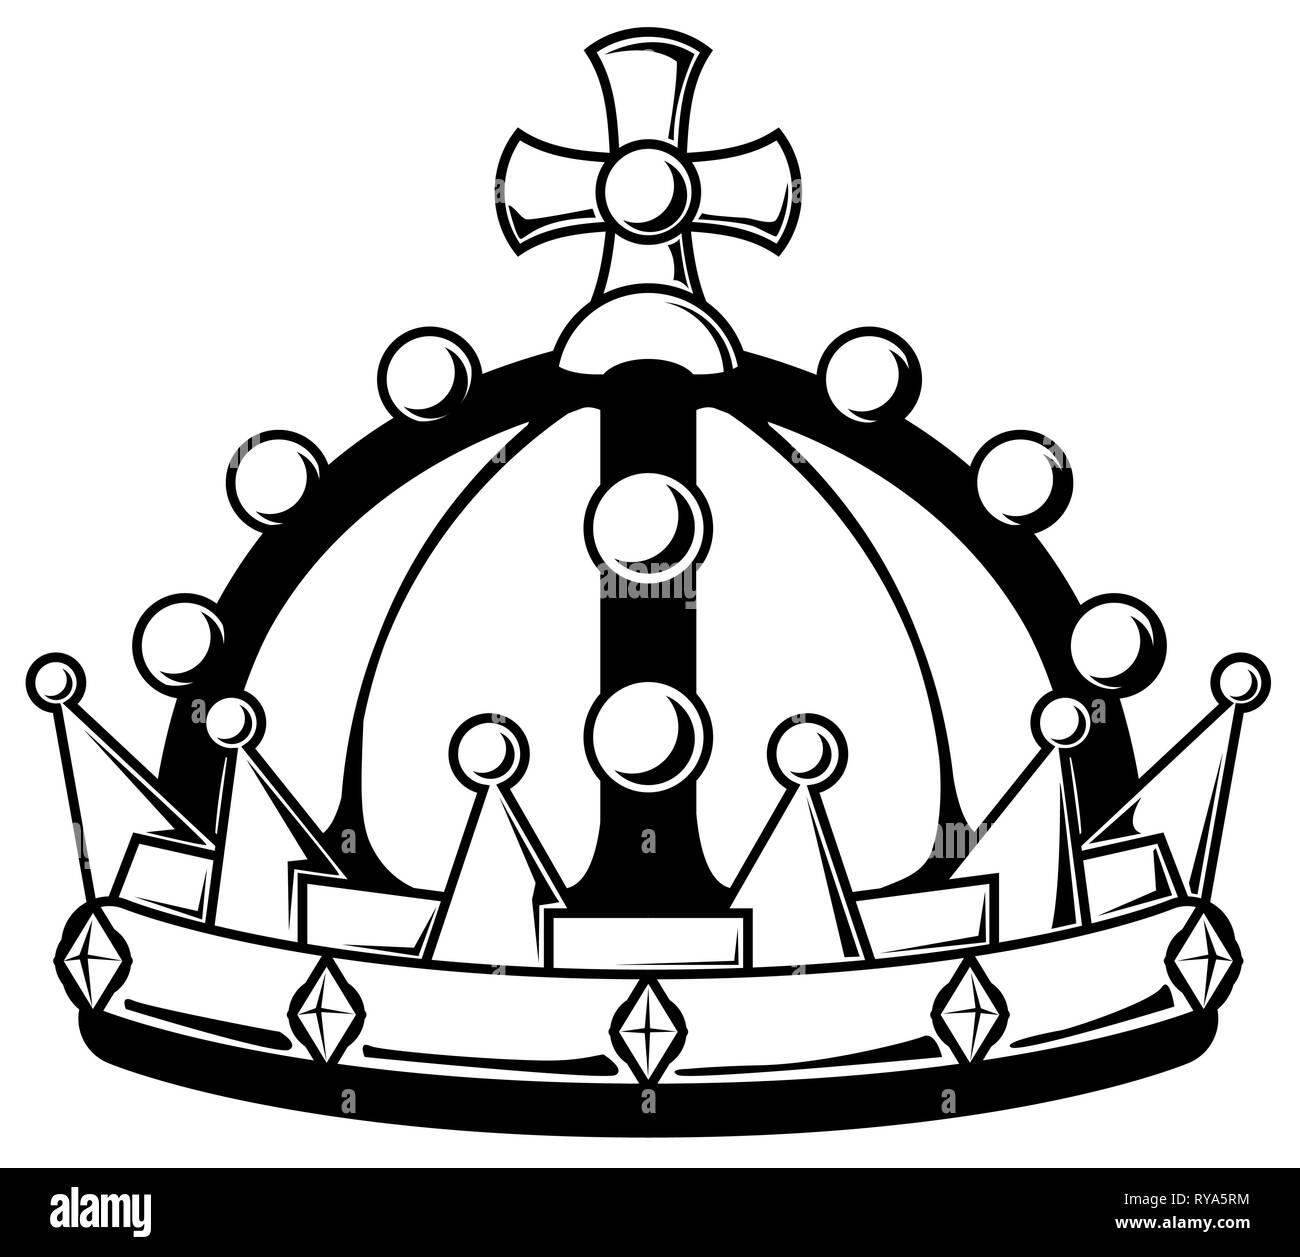 Royal crown stencil black, vector illustration, horizontal, isolated - Stock Vector